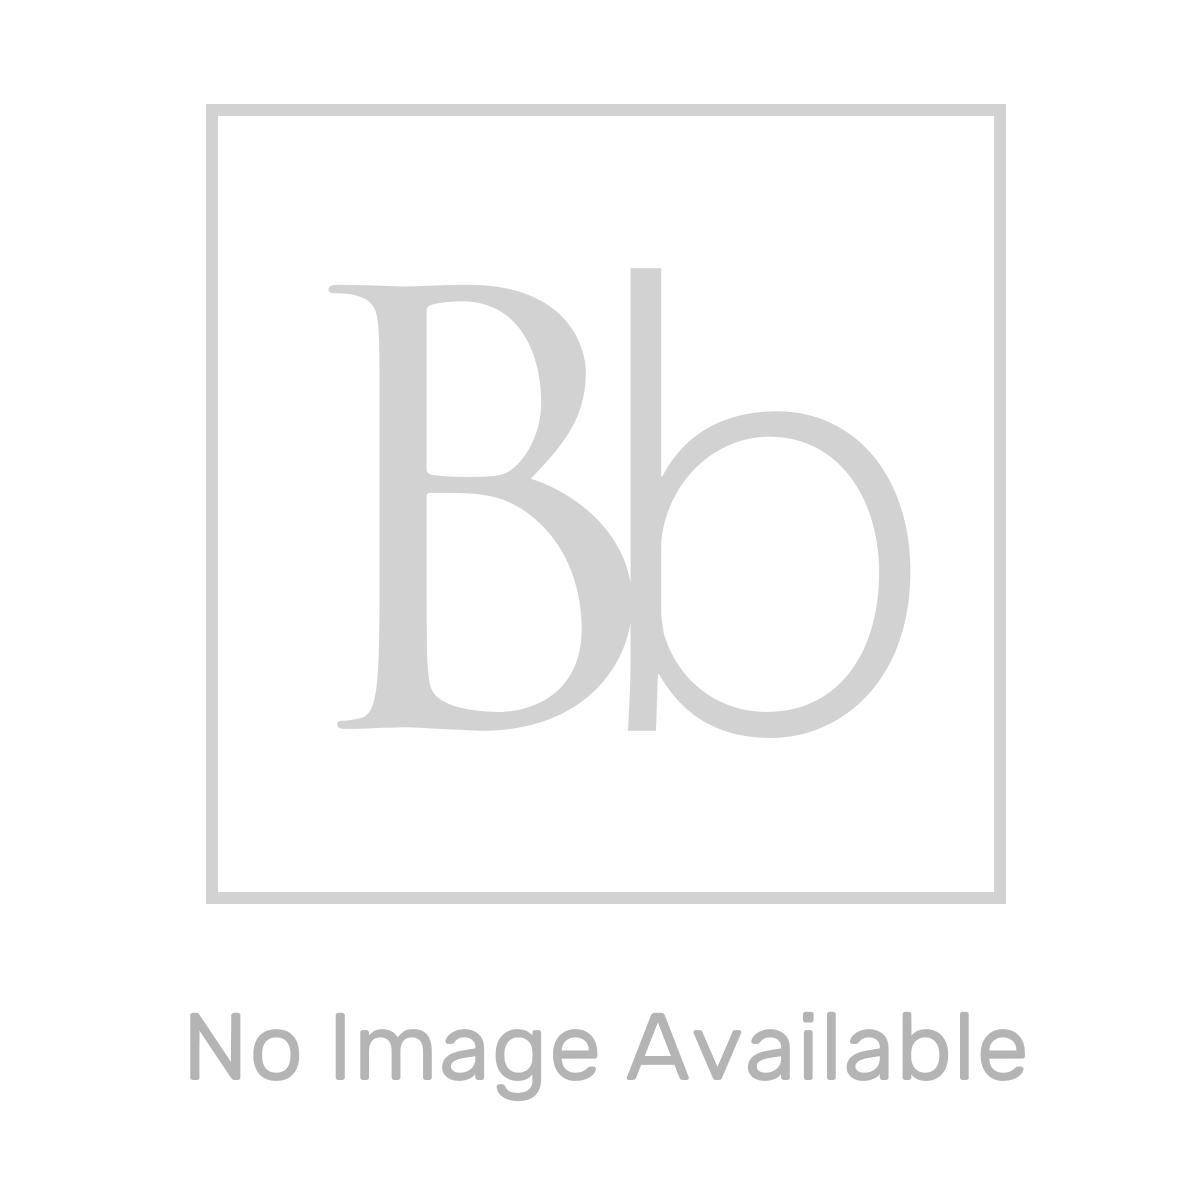 RAK Chrome Round Mixer Shower Measurements